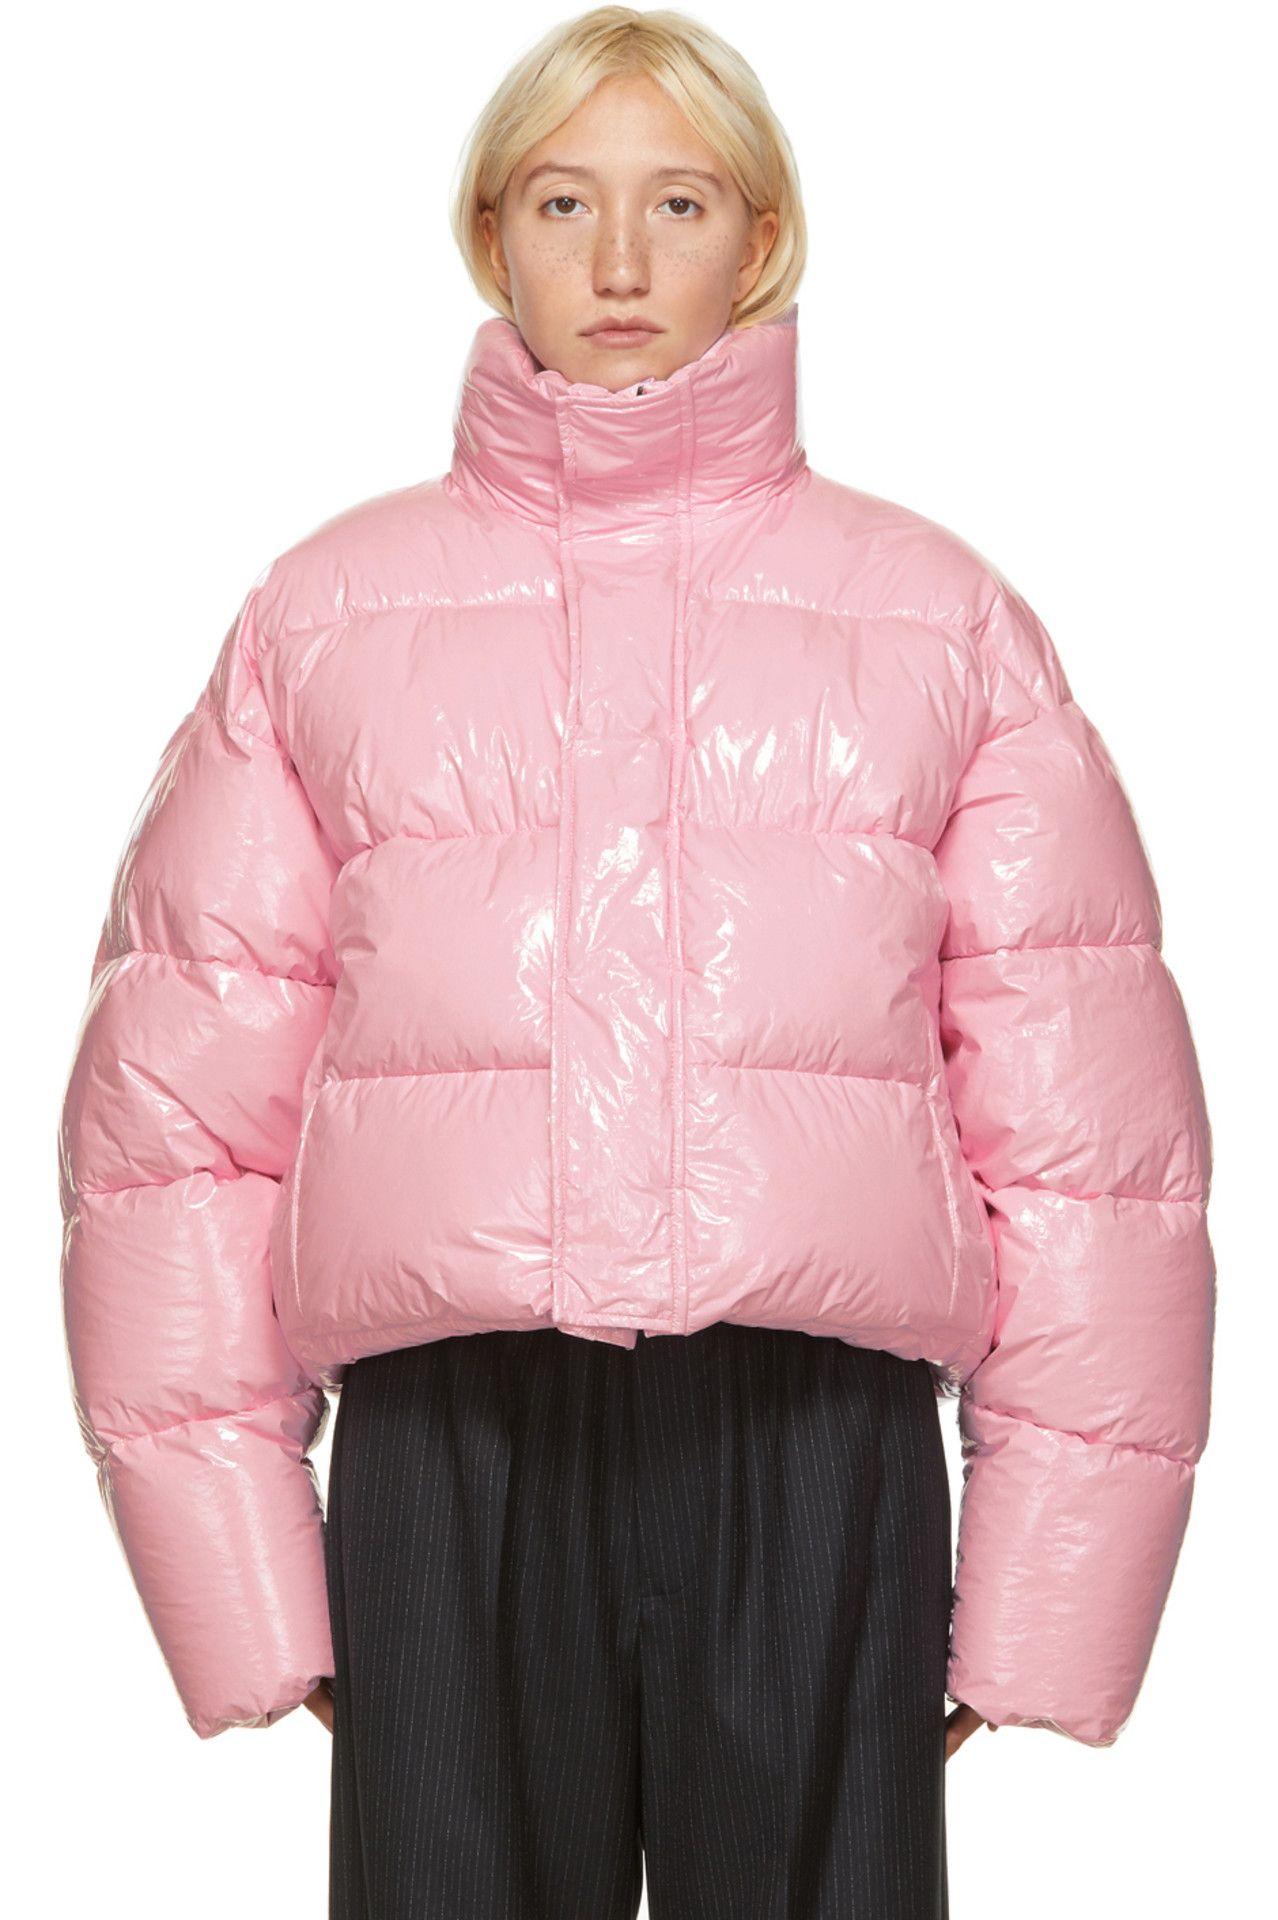 Balenciaga Pink Shiny Cropped Puffer Jacket Ssense Balenciaga Clothing Cropped Puffer Jacket Balenciaga [ 1920 x 1278 Pixel ]